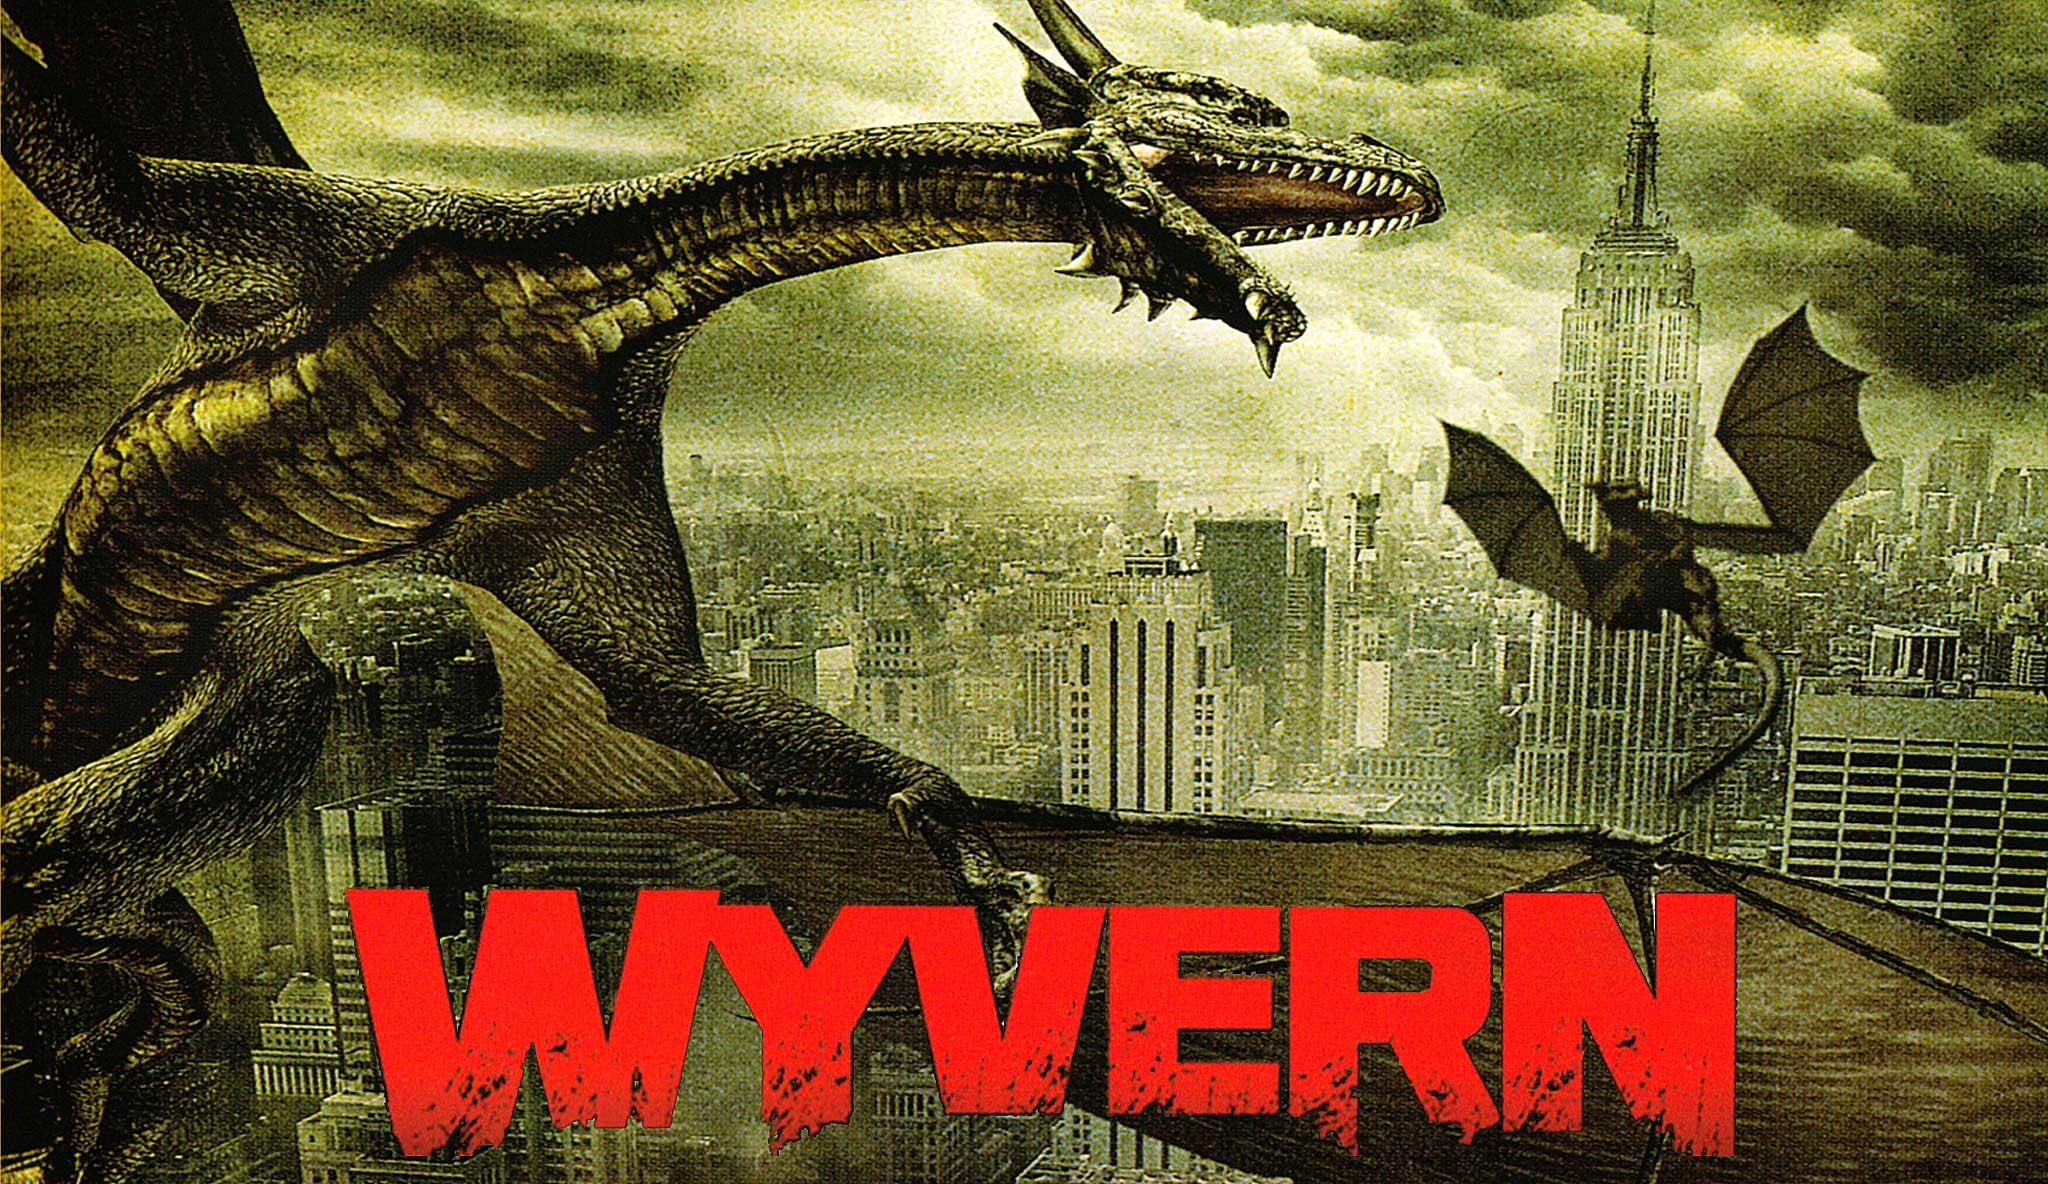 wyvern-rise-of-the-dragon\header.jpg